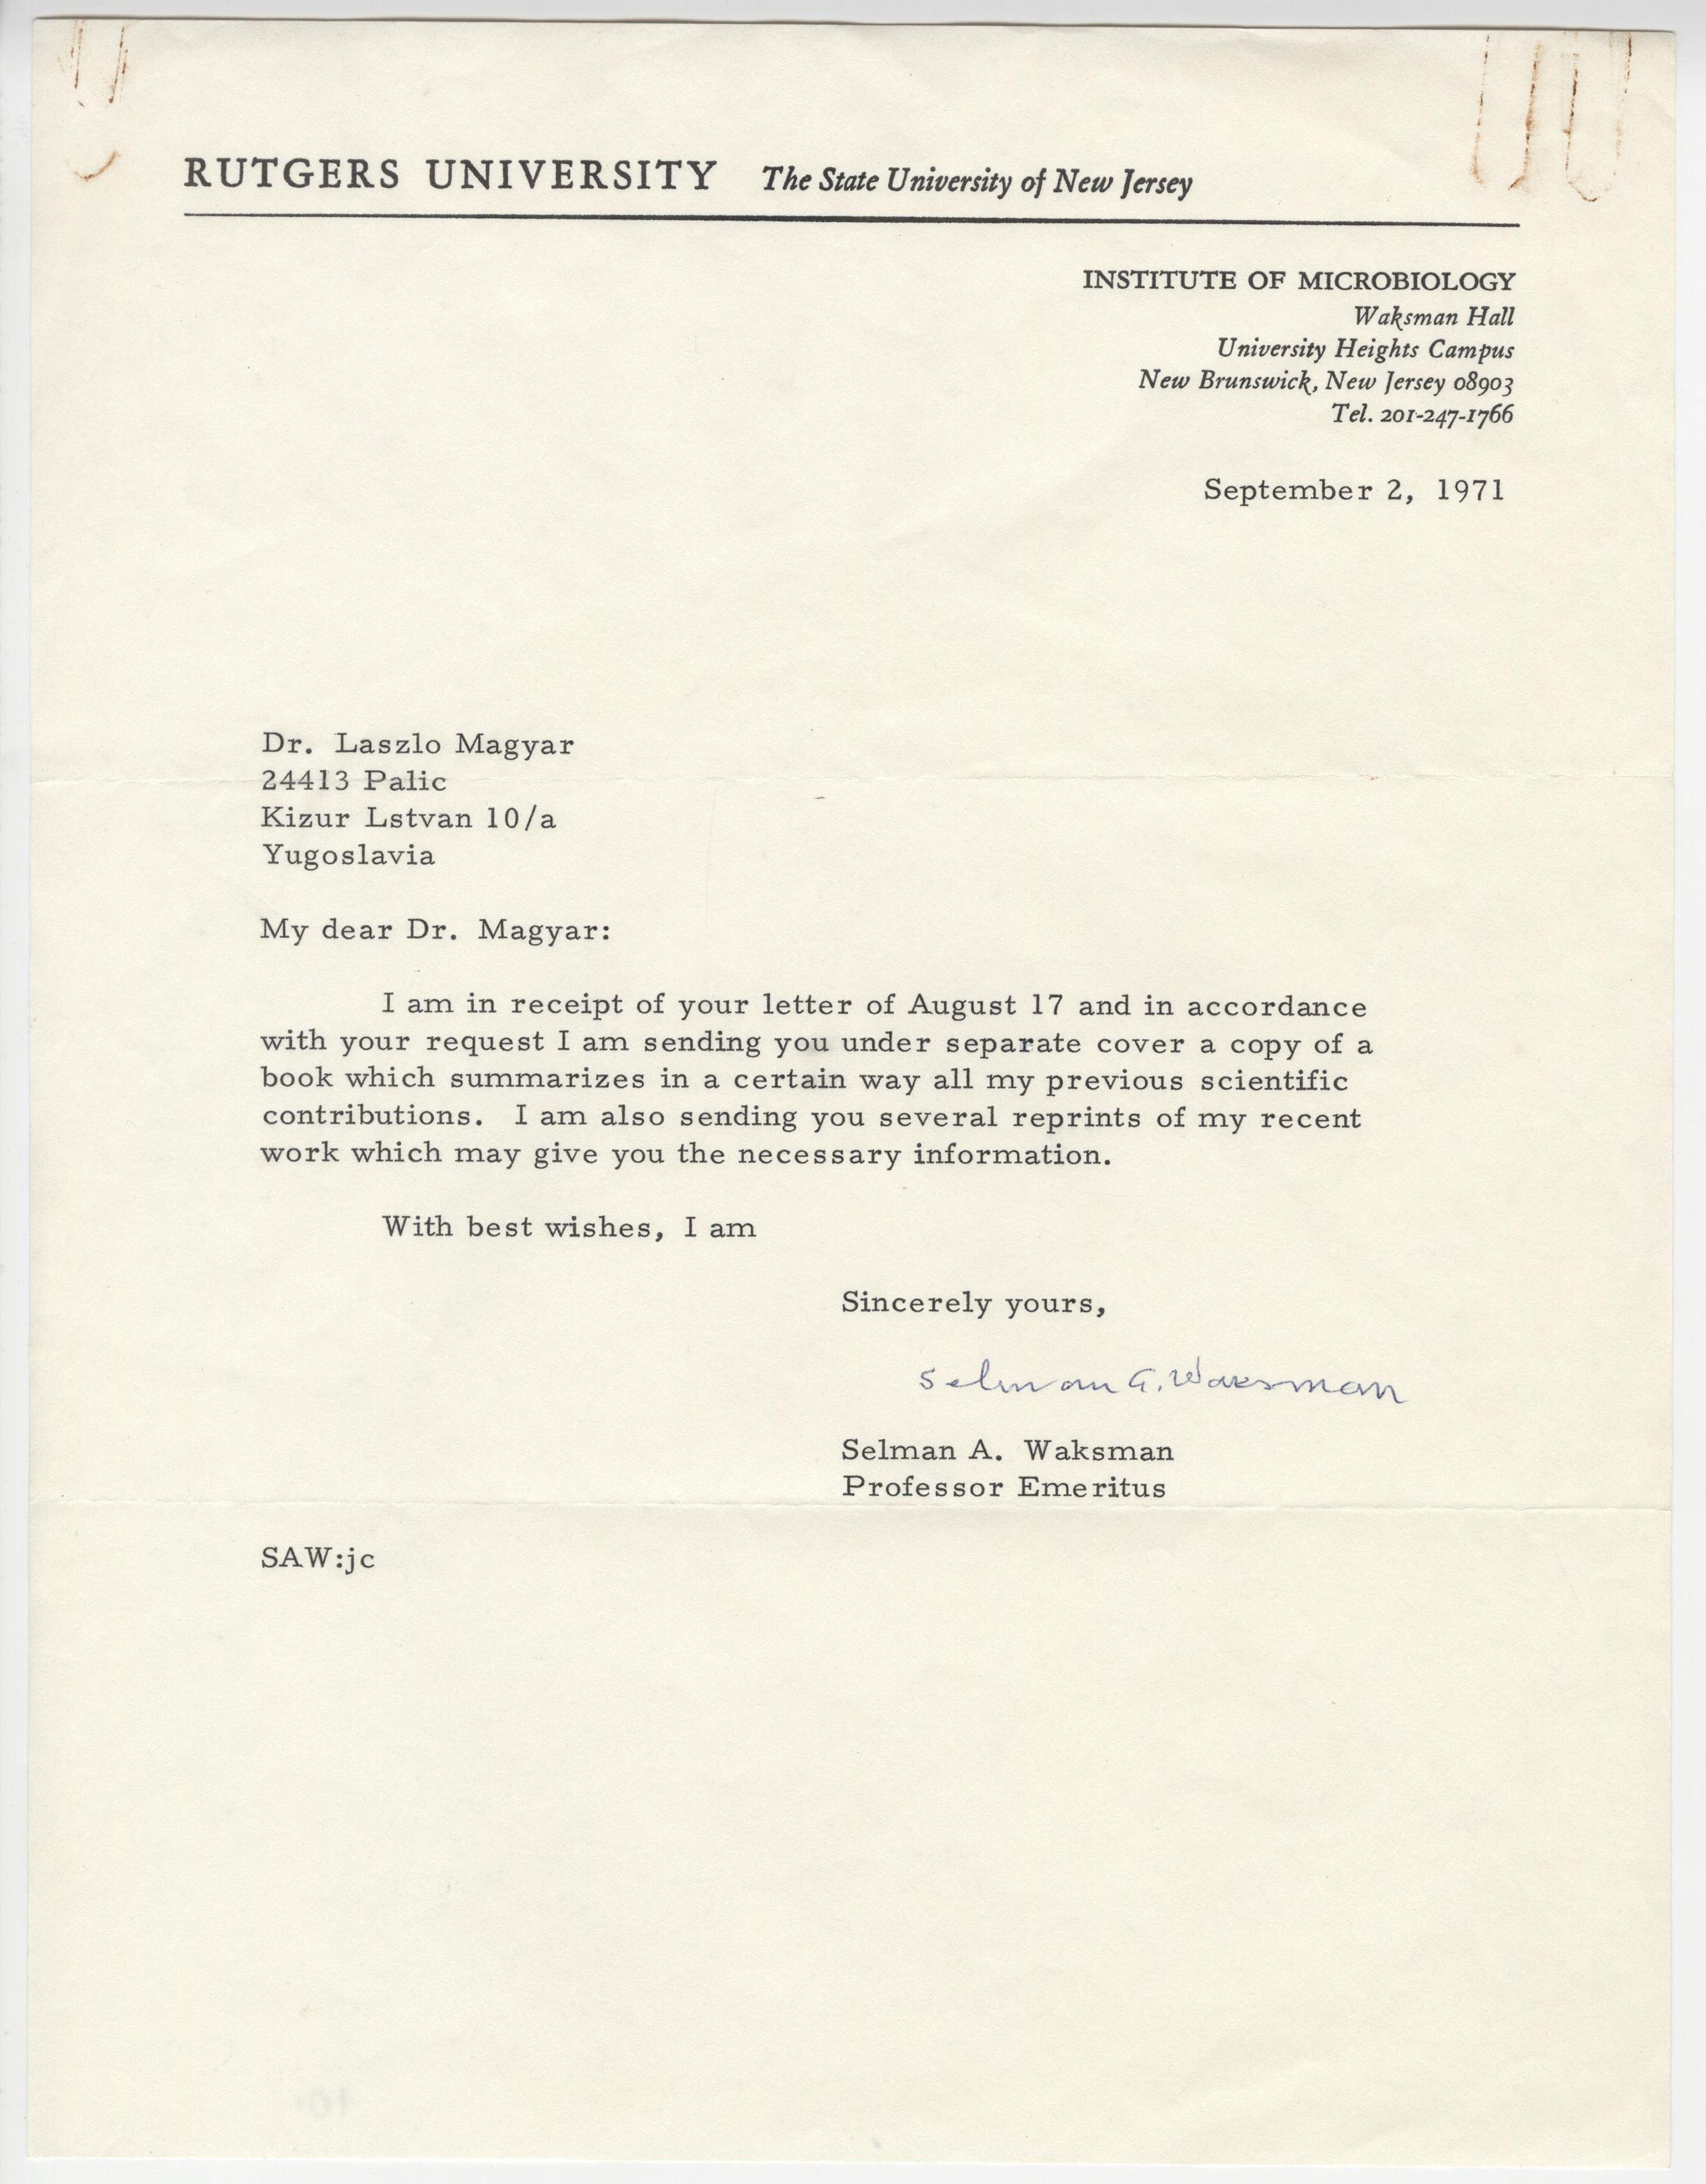 Nobel Prize Laureate Selman Waksman TLS on Scientific Contributions